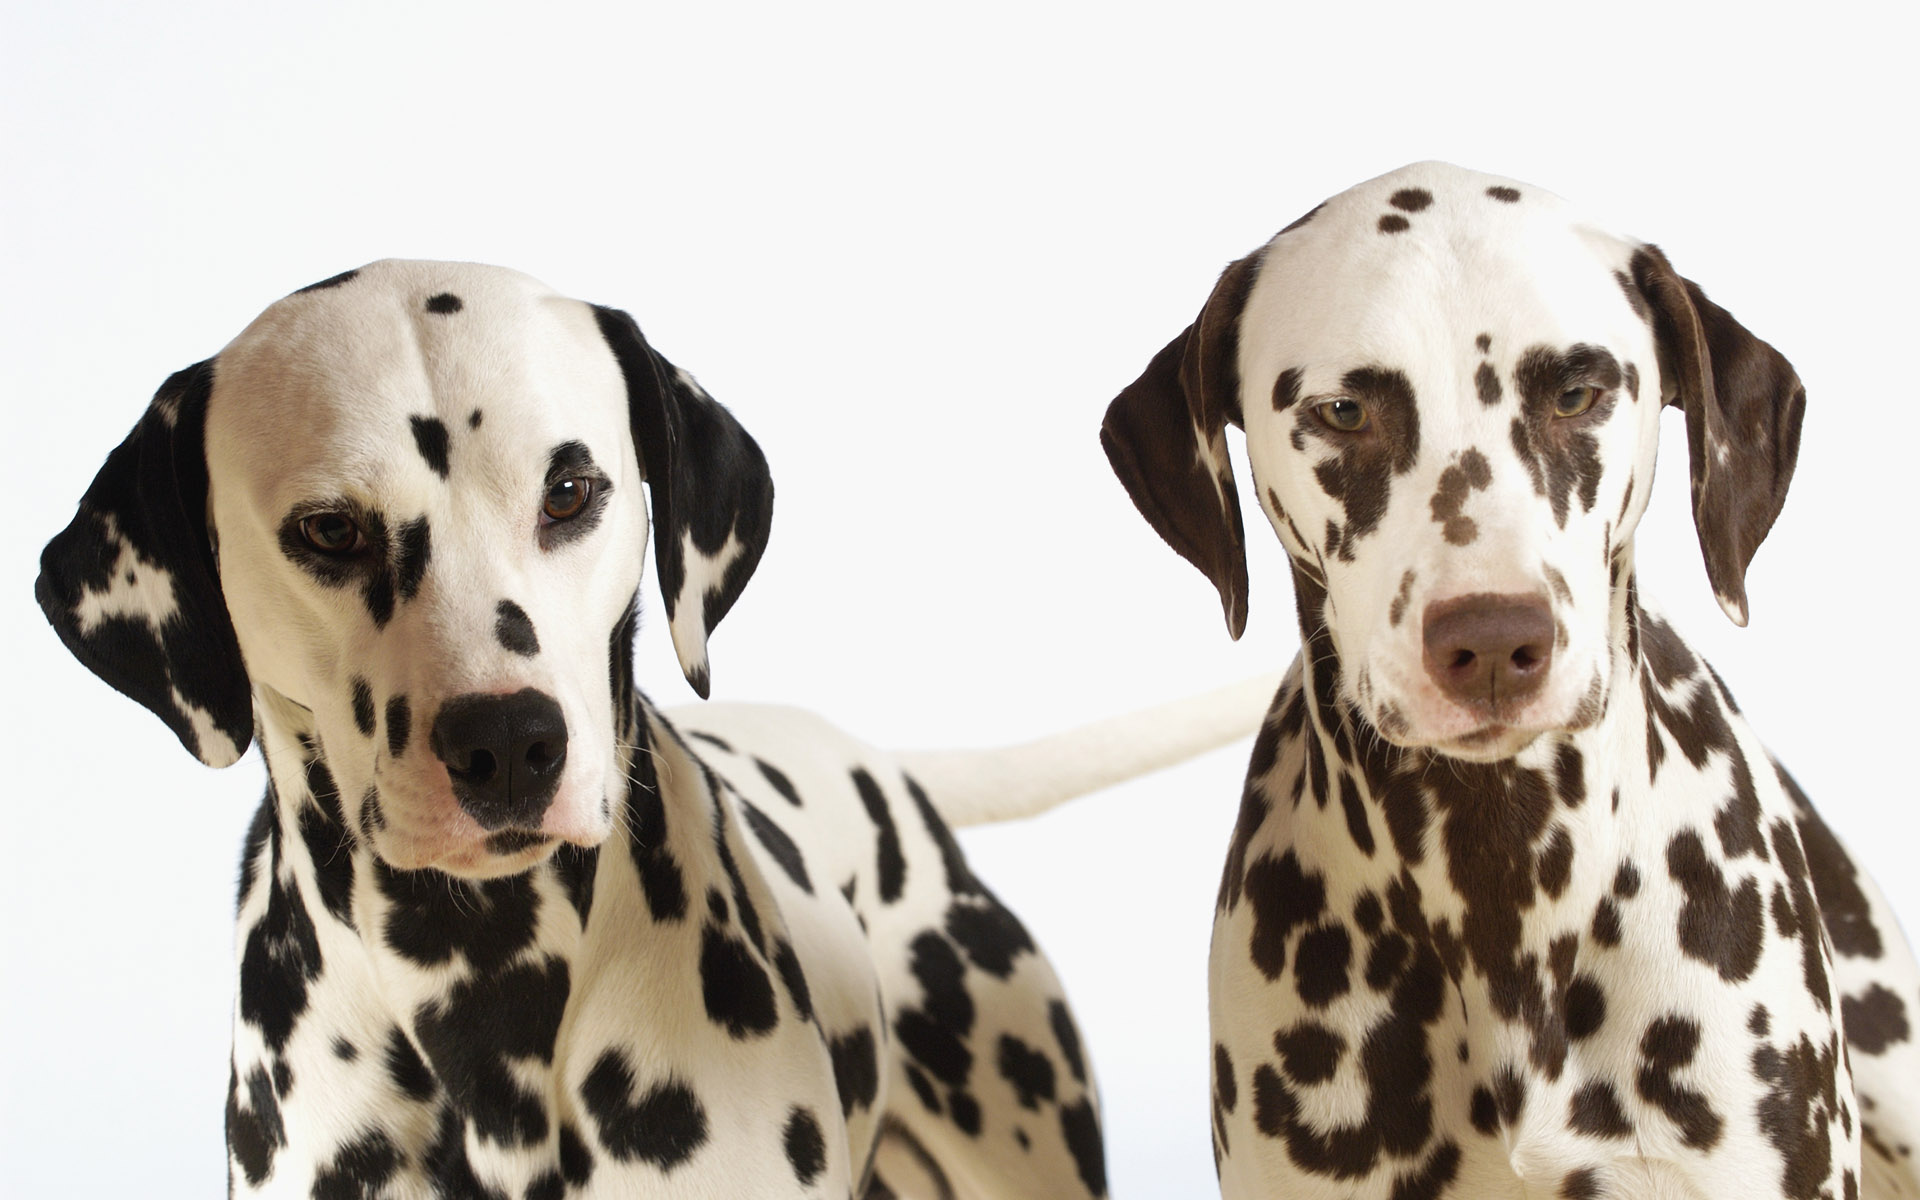 pics of dalmatian dogs